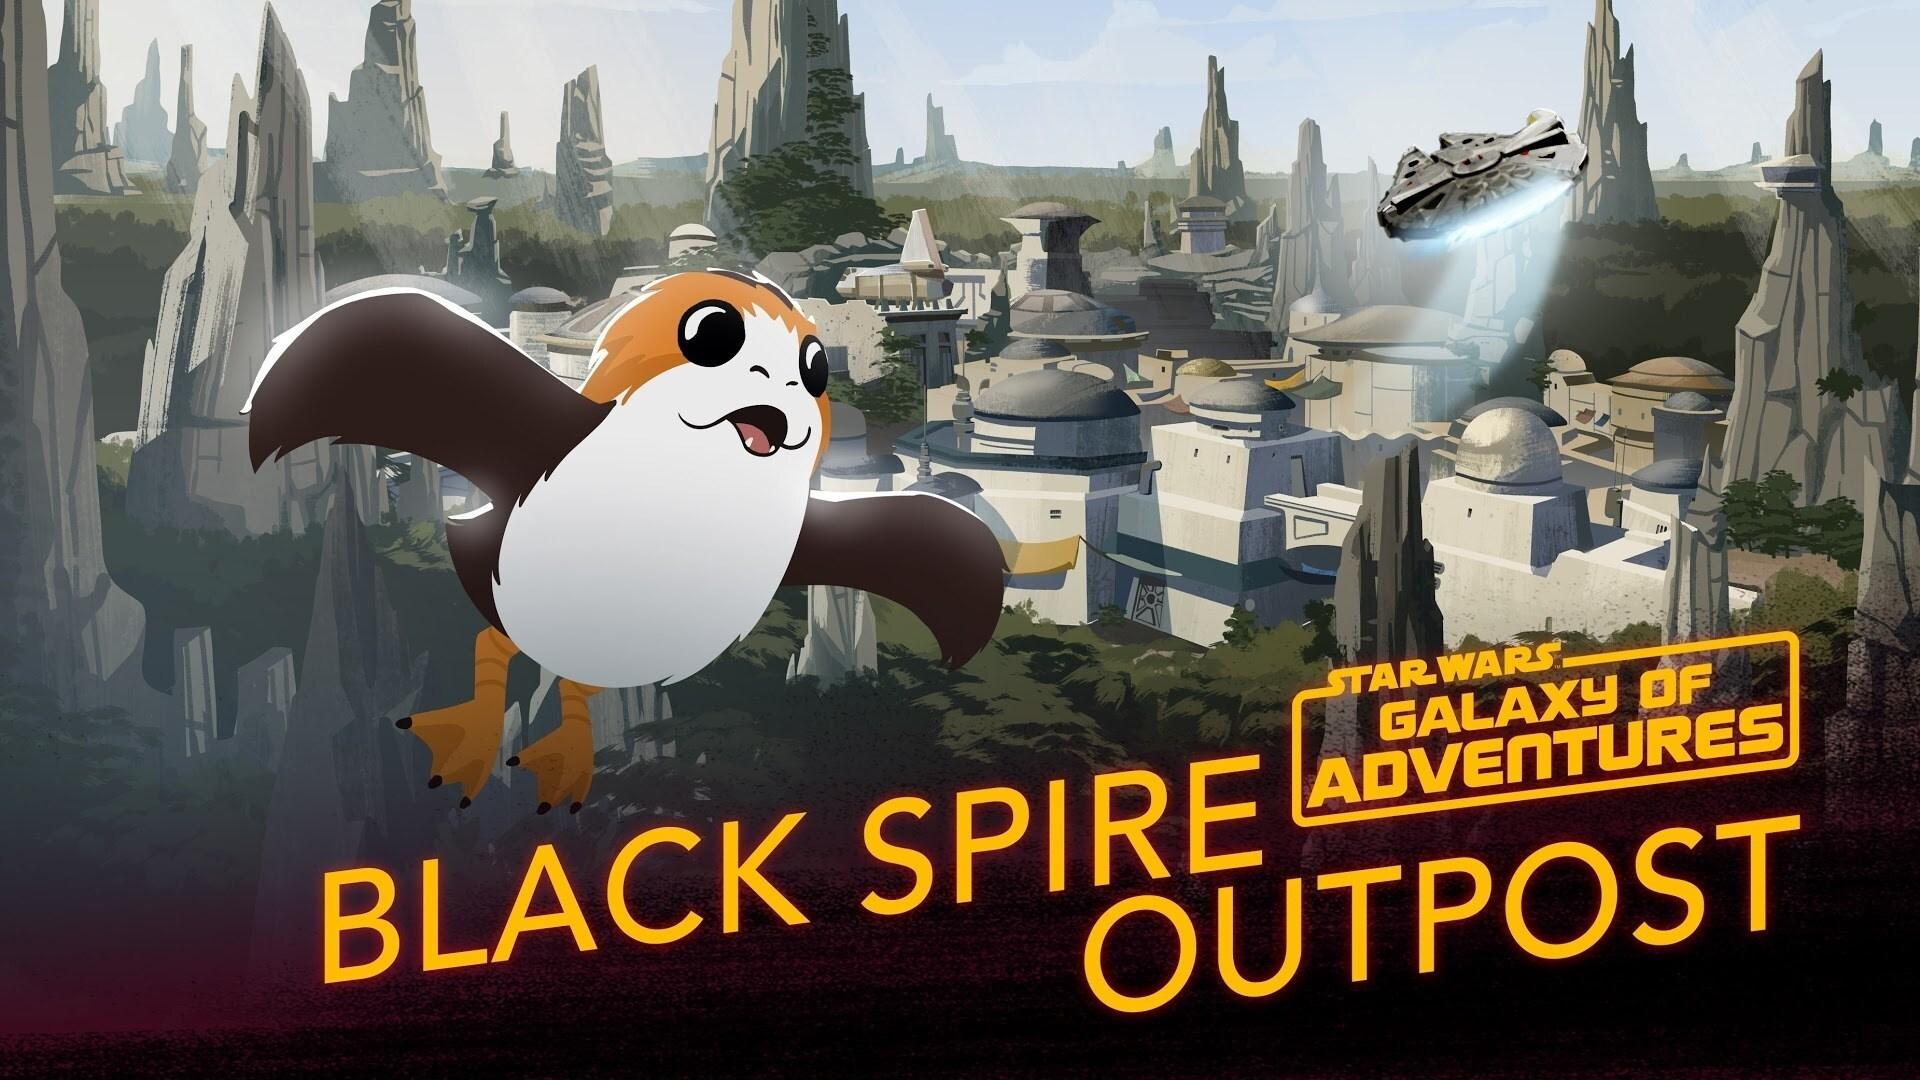 Black Spire Outpost | Star Wars Galaxy of Adventures